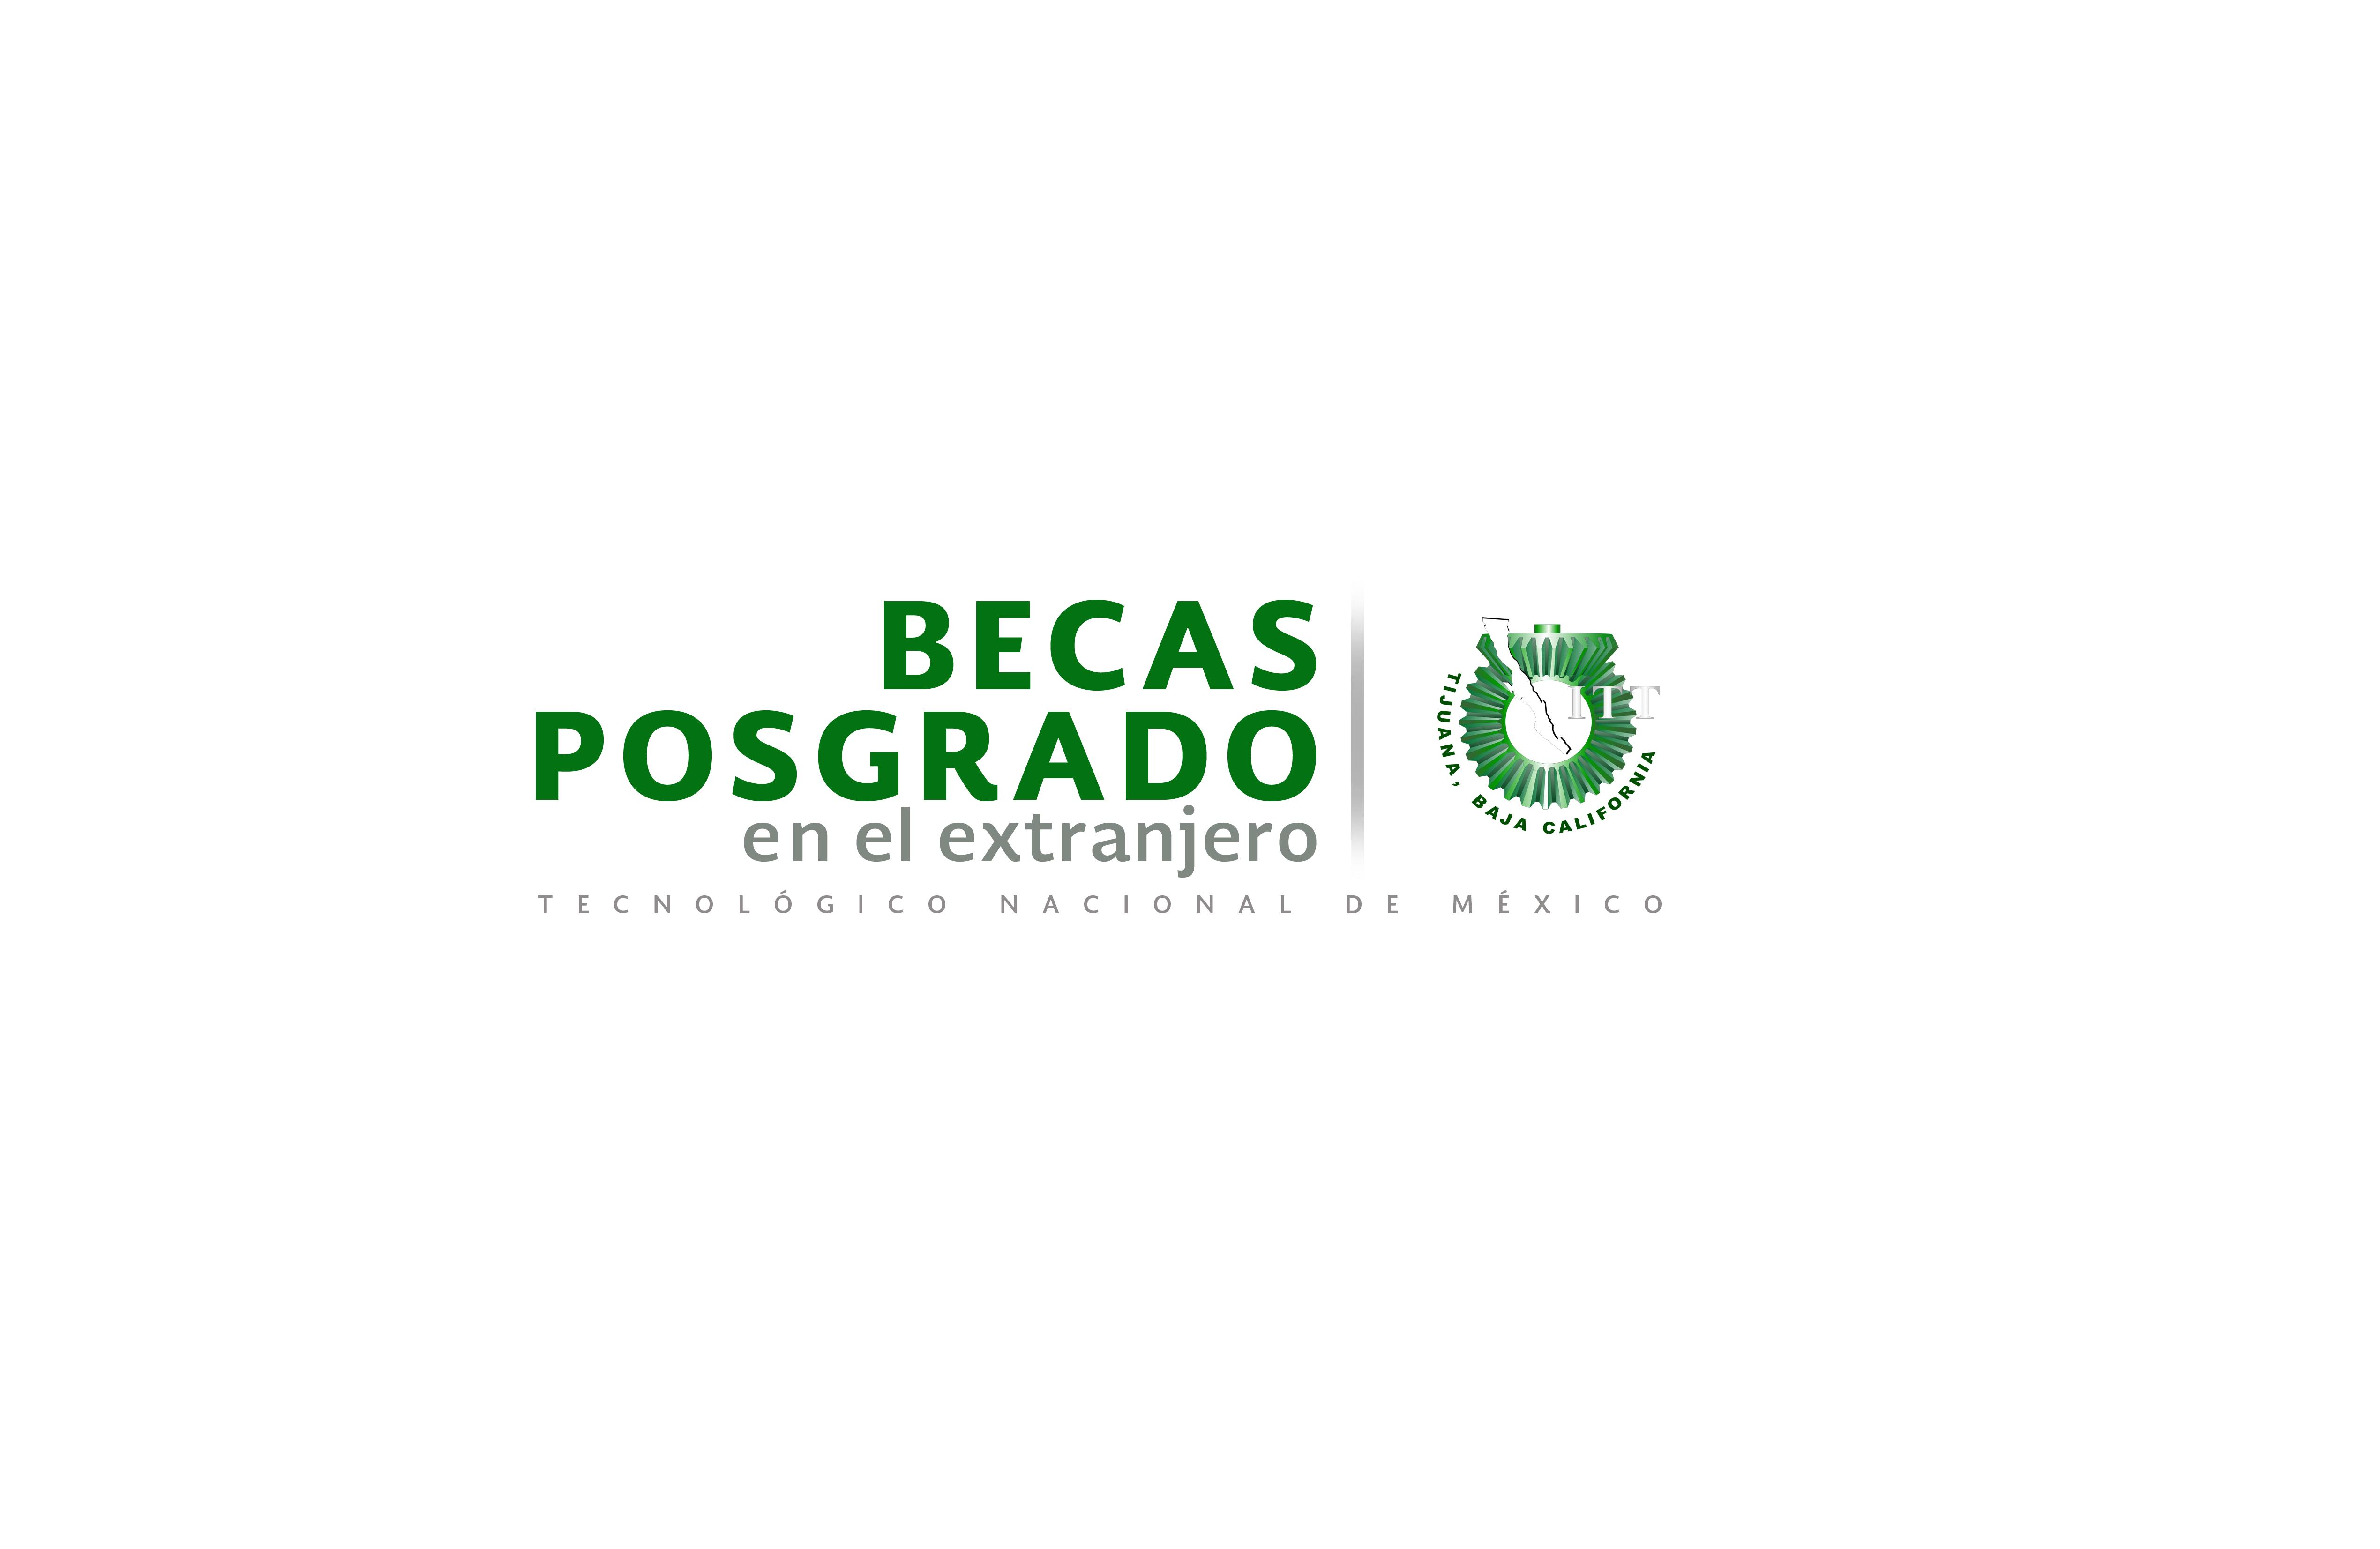 Instituto tecnol gico de tijuana becas de posgrado para for Docentes en el exterior 2016